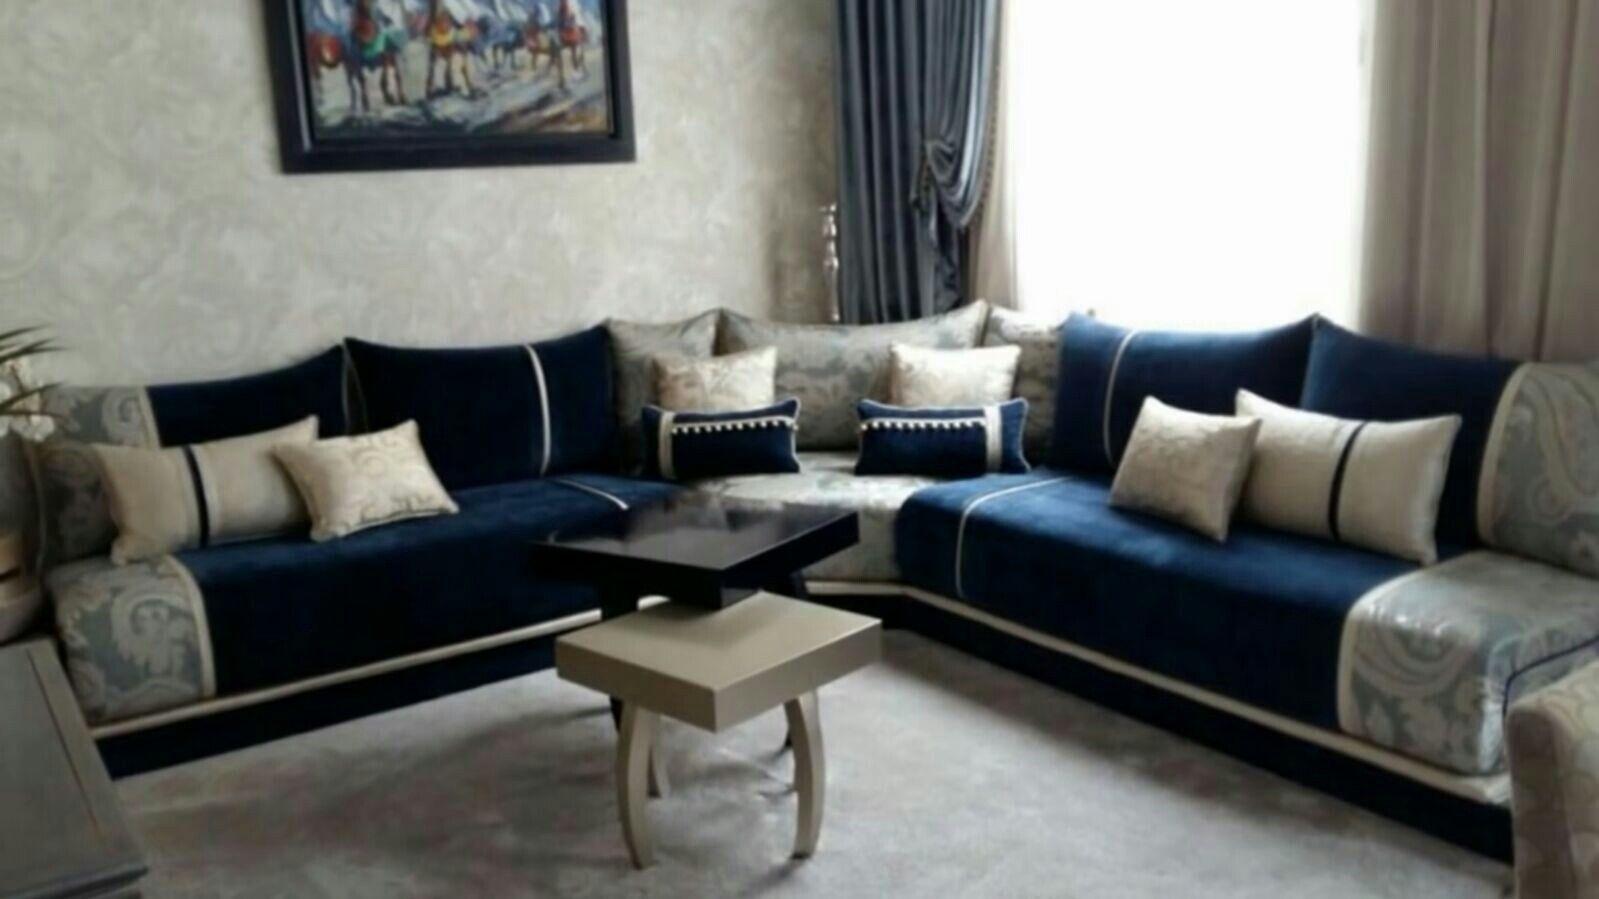 Pingl par saristastory sur salon marocain living room salon marocain et moroccan interiors for Salon berbere moderne